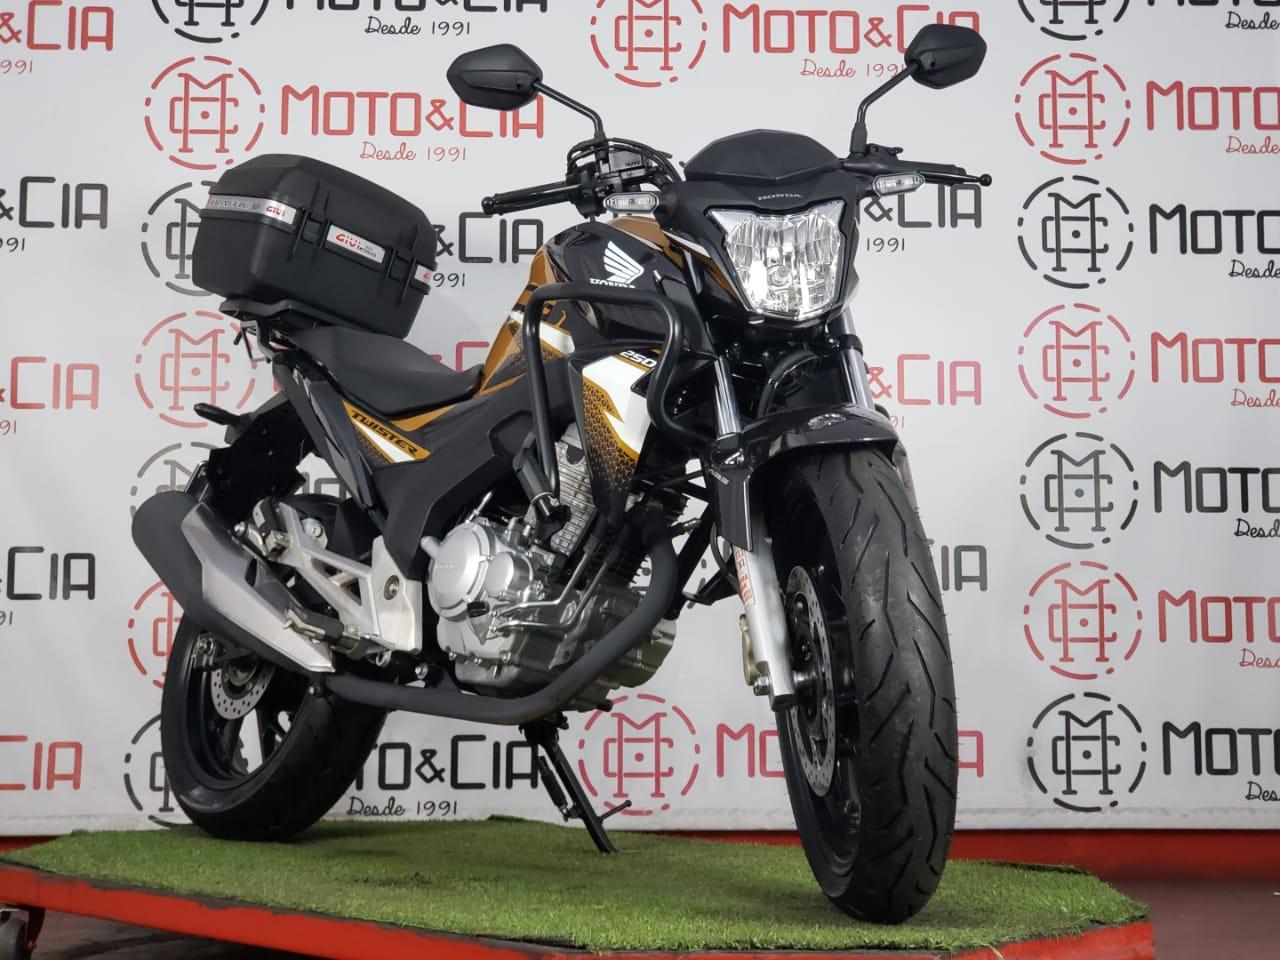 Honda - CB 250F Twister ABS